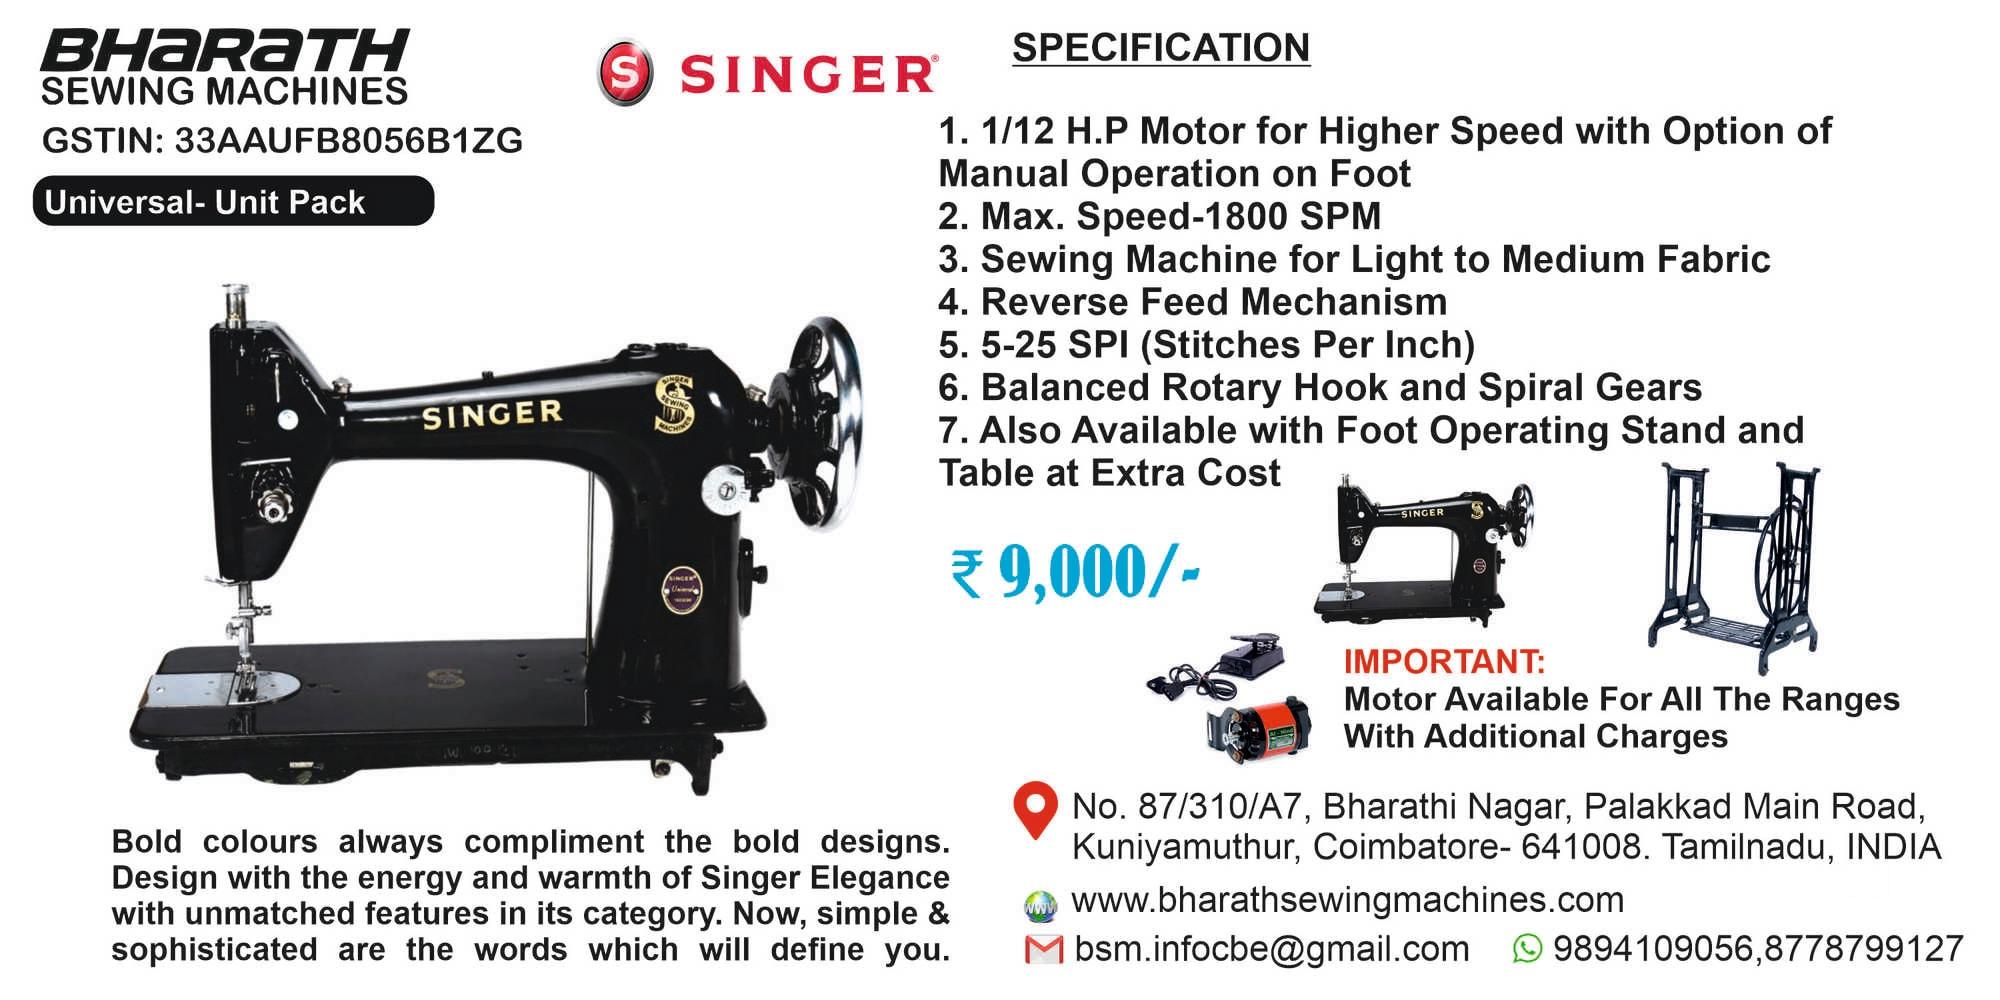 Top 30 Singer Sewing Machine Dealers in Coimbatore - Best Singer